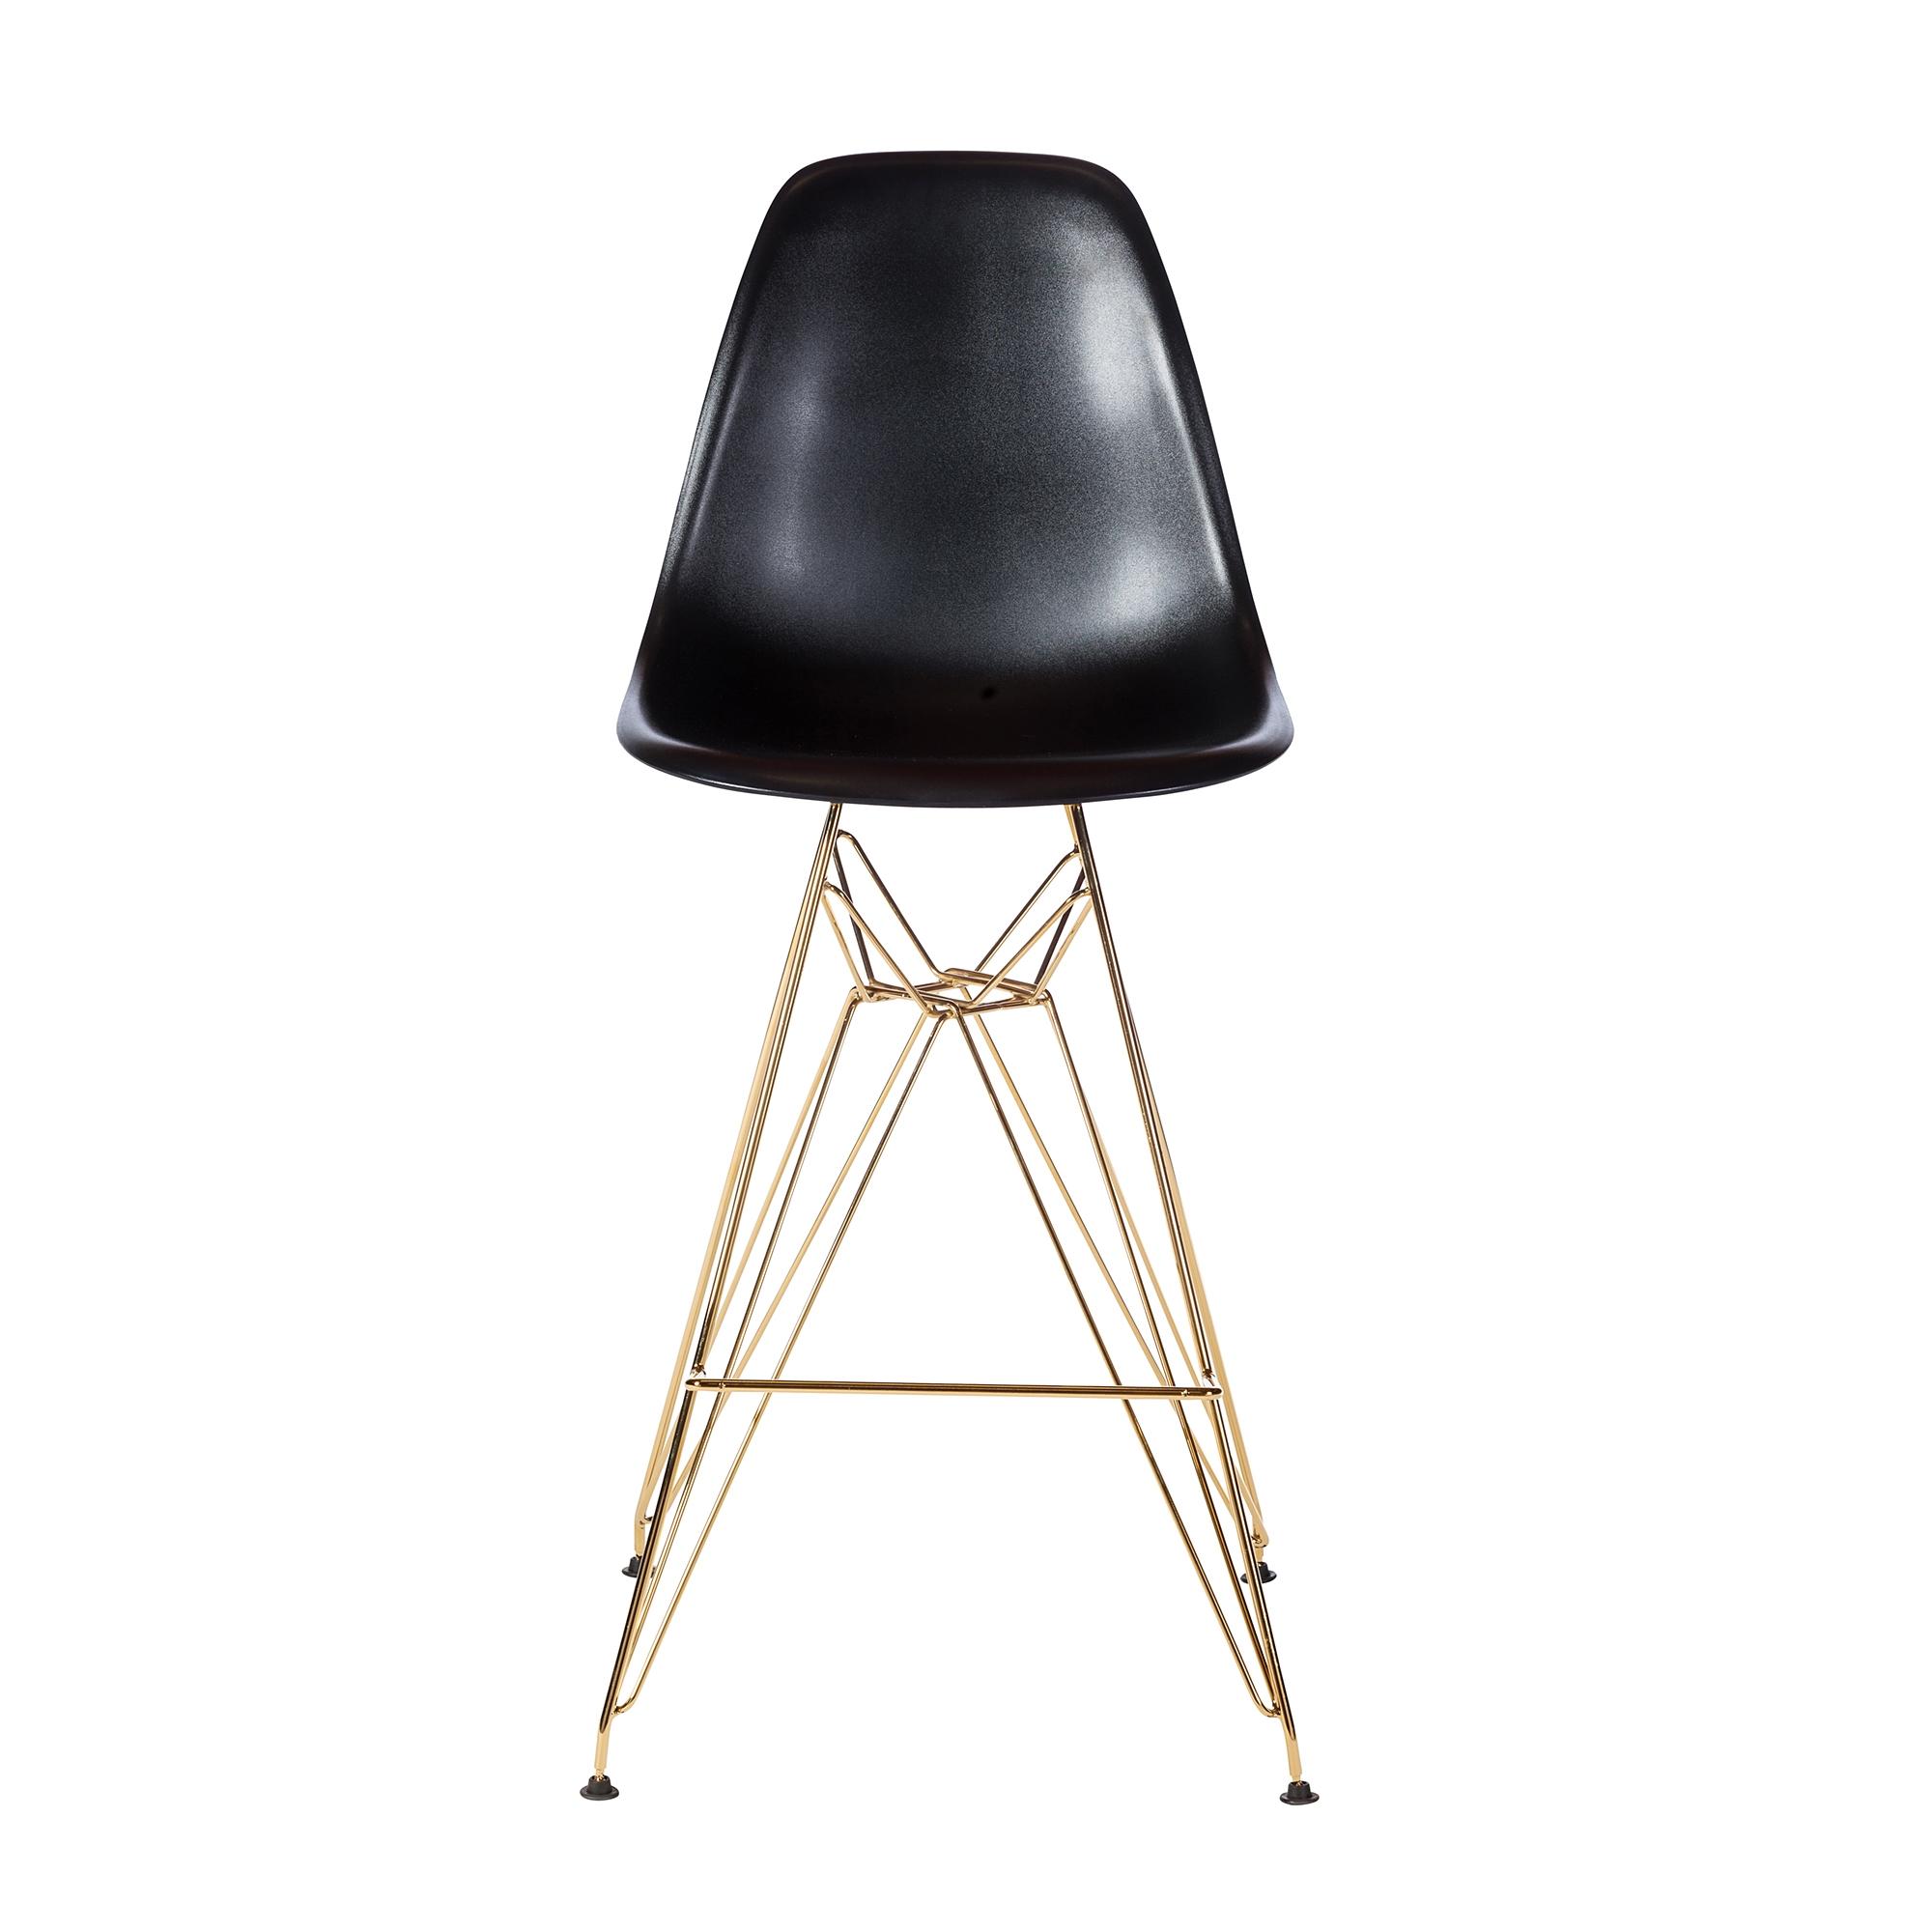 Excellent Molded Acrylic Bar Stool In Black And Gold Finish Legs Customarchery Wood Chair Design Ideas Customarcherynet